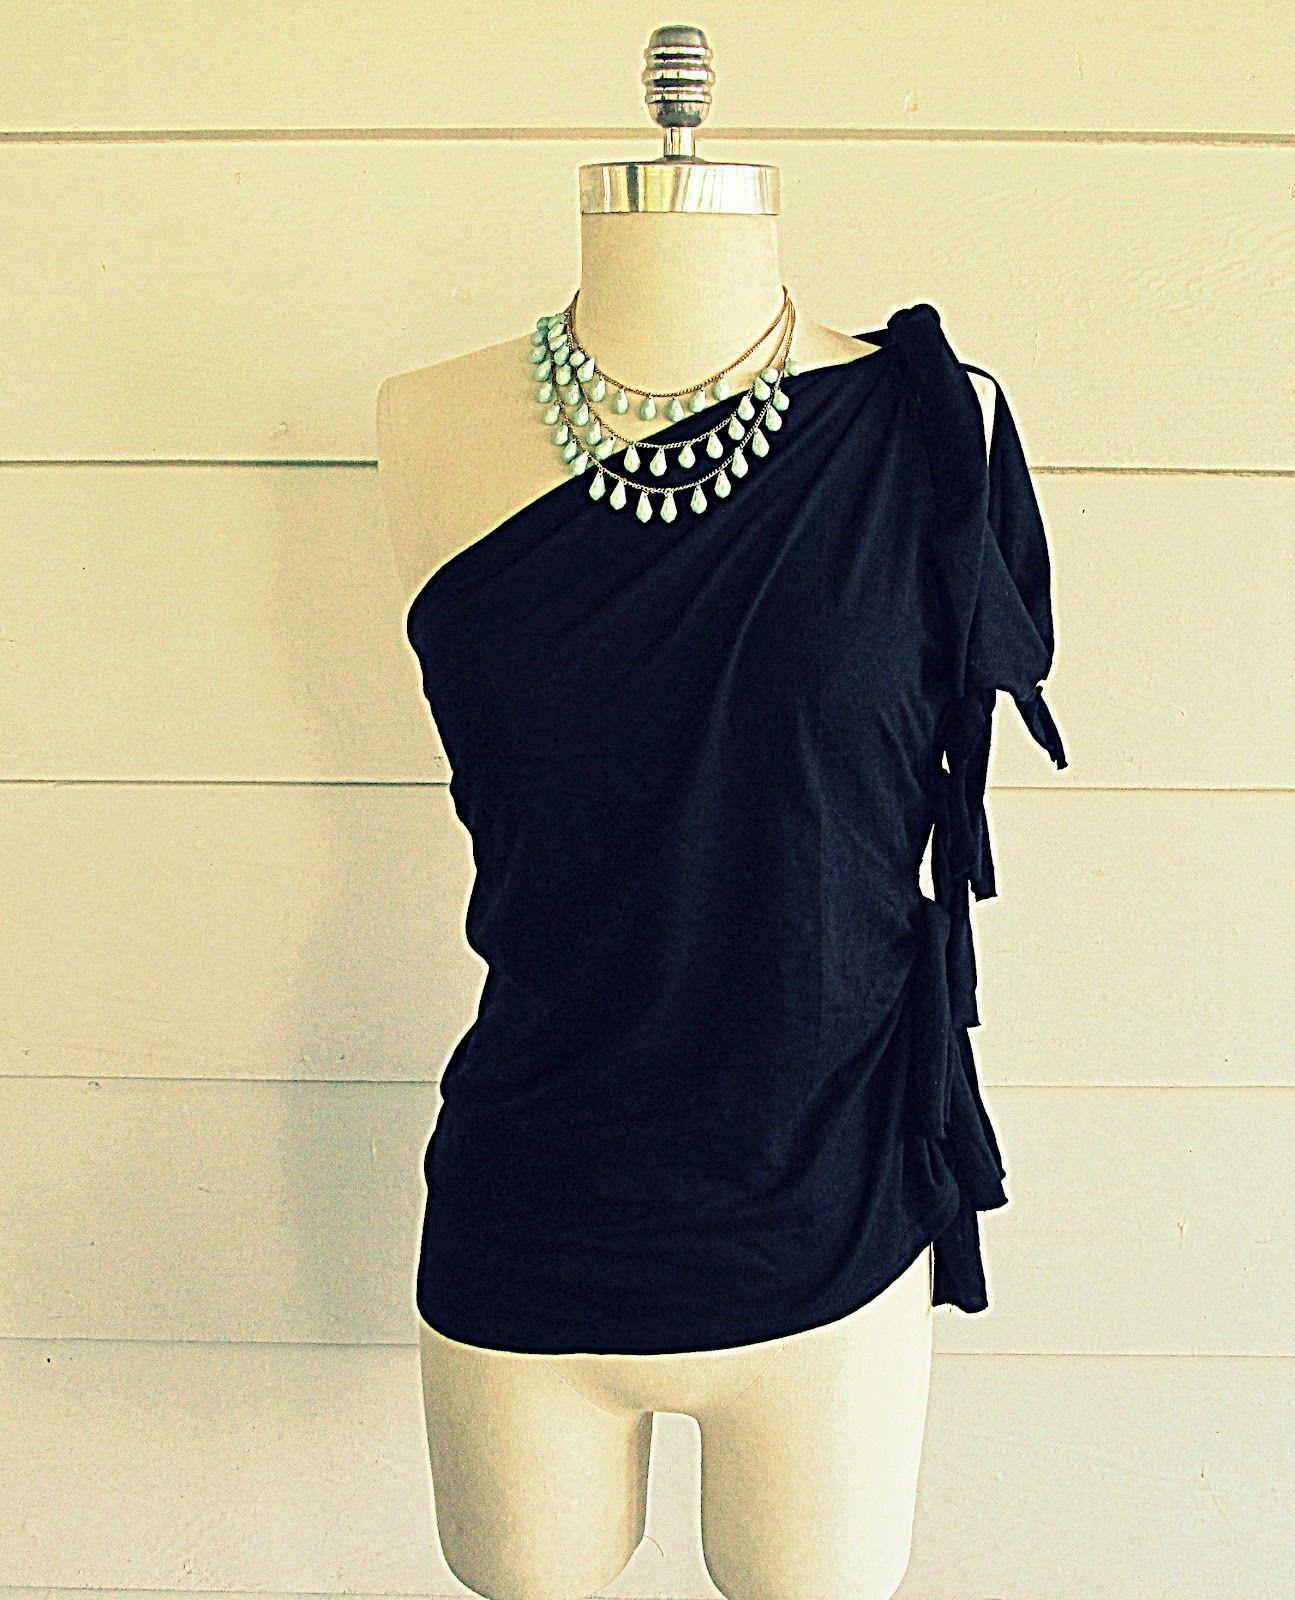 Black t shirt diy - Diy Ideas T Shirt Makeovers